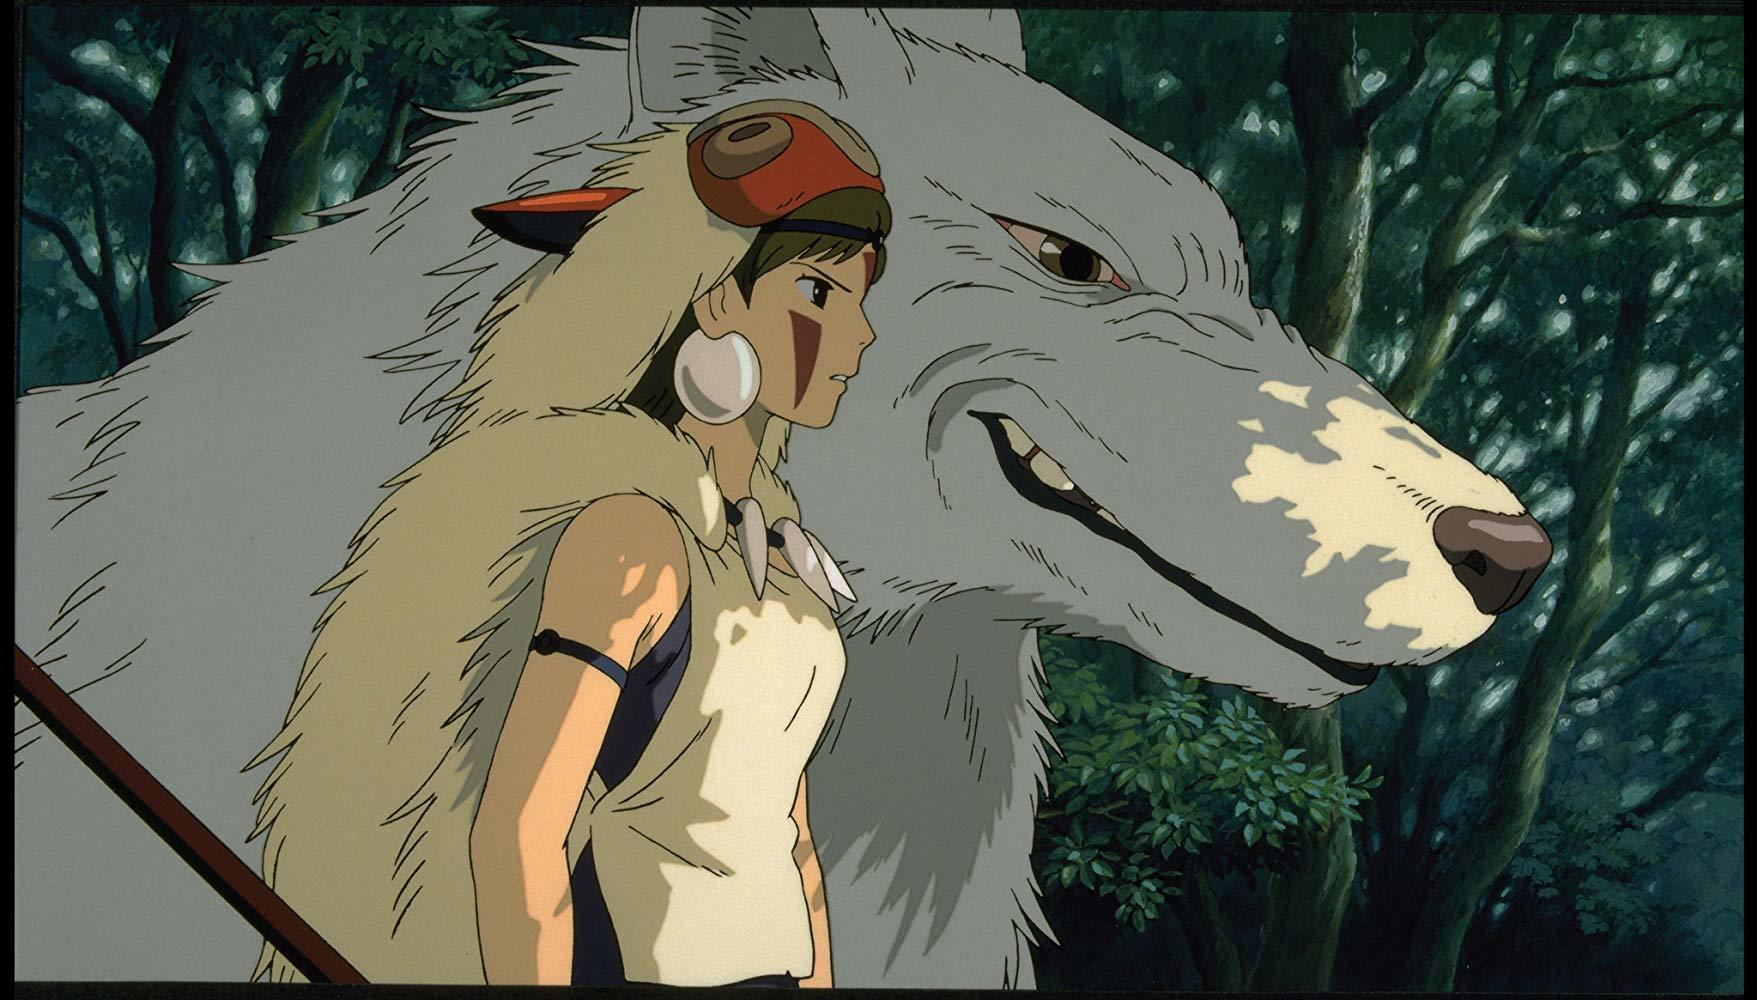 © 1997 Studio Ghibli